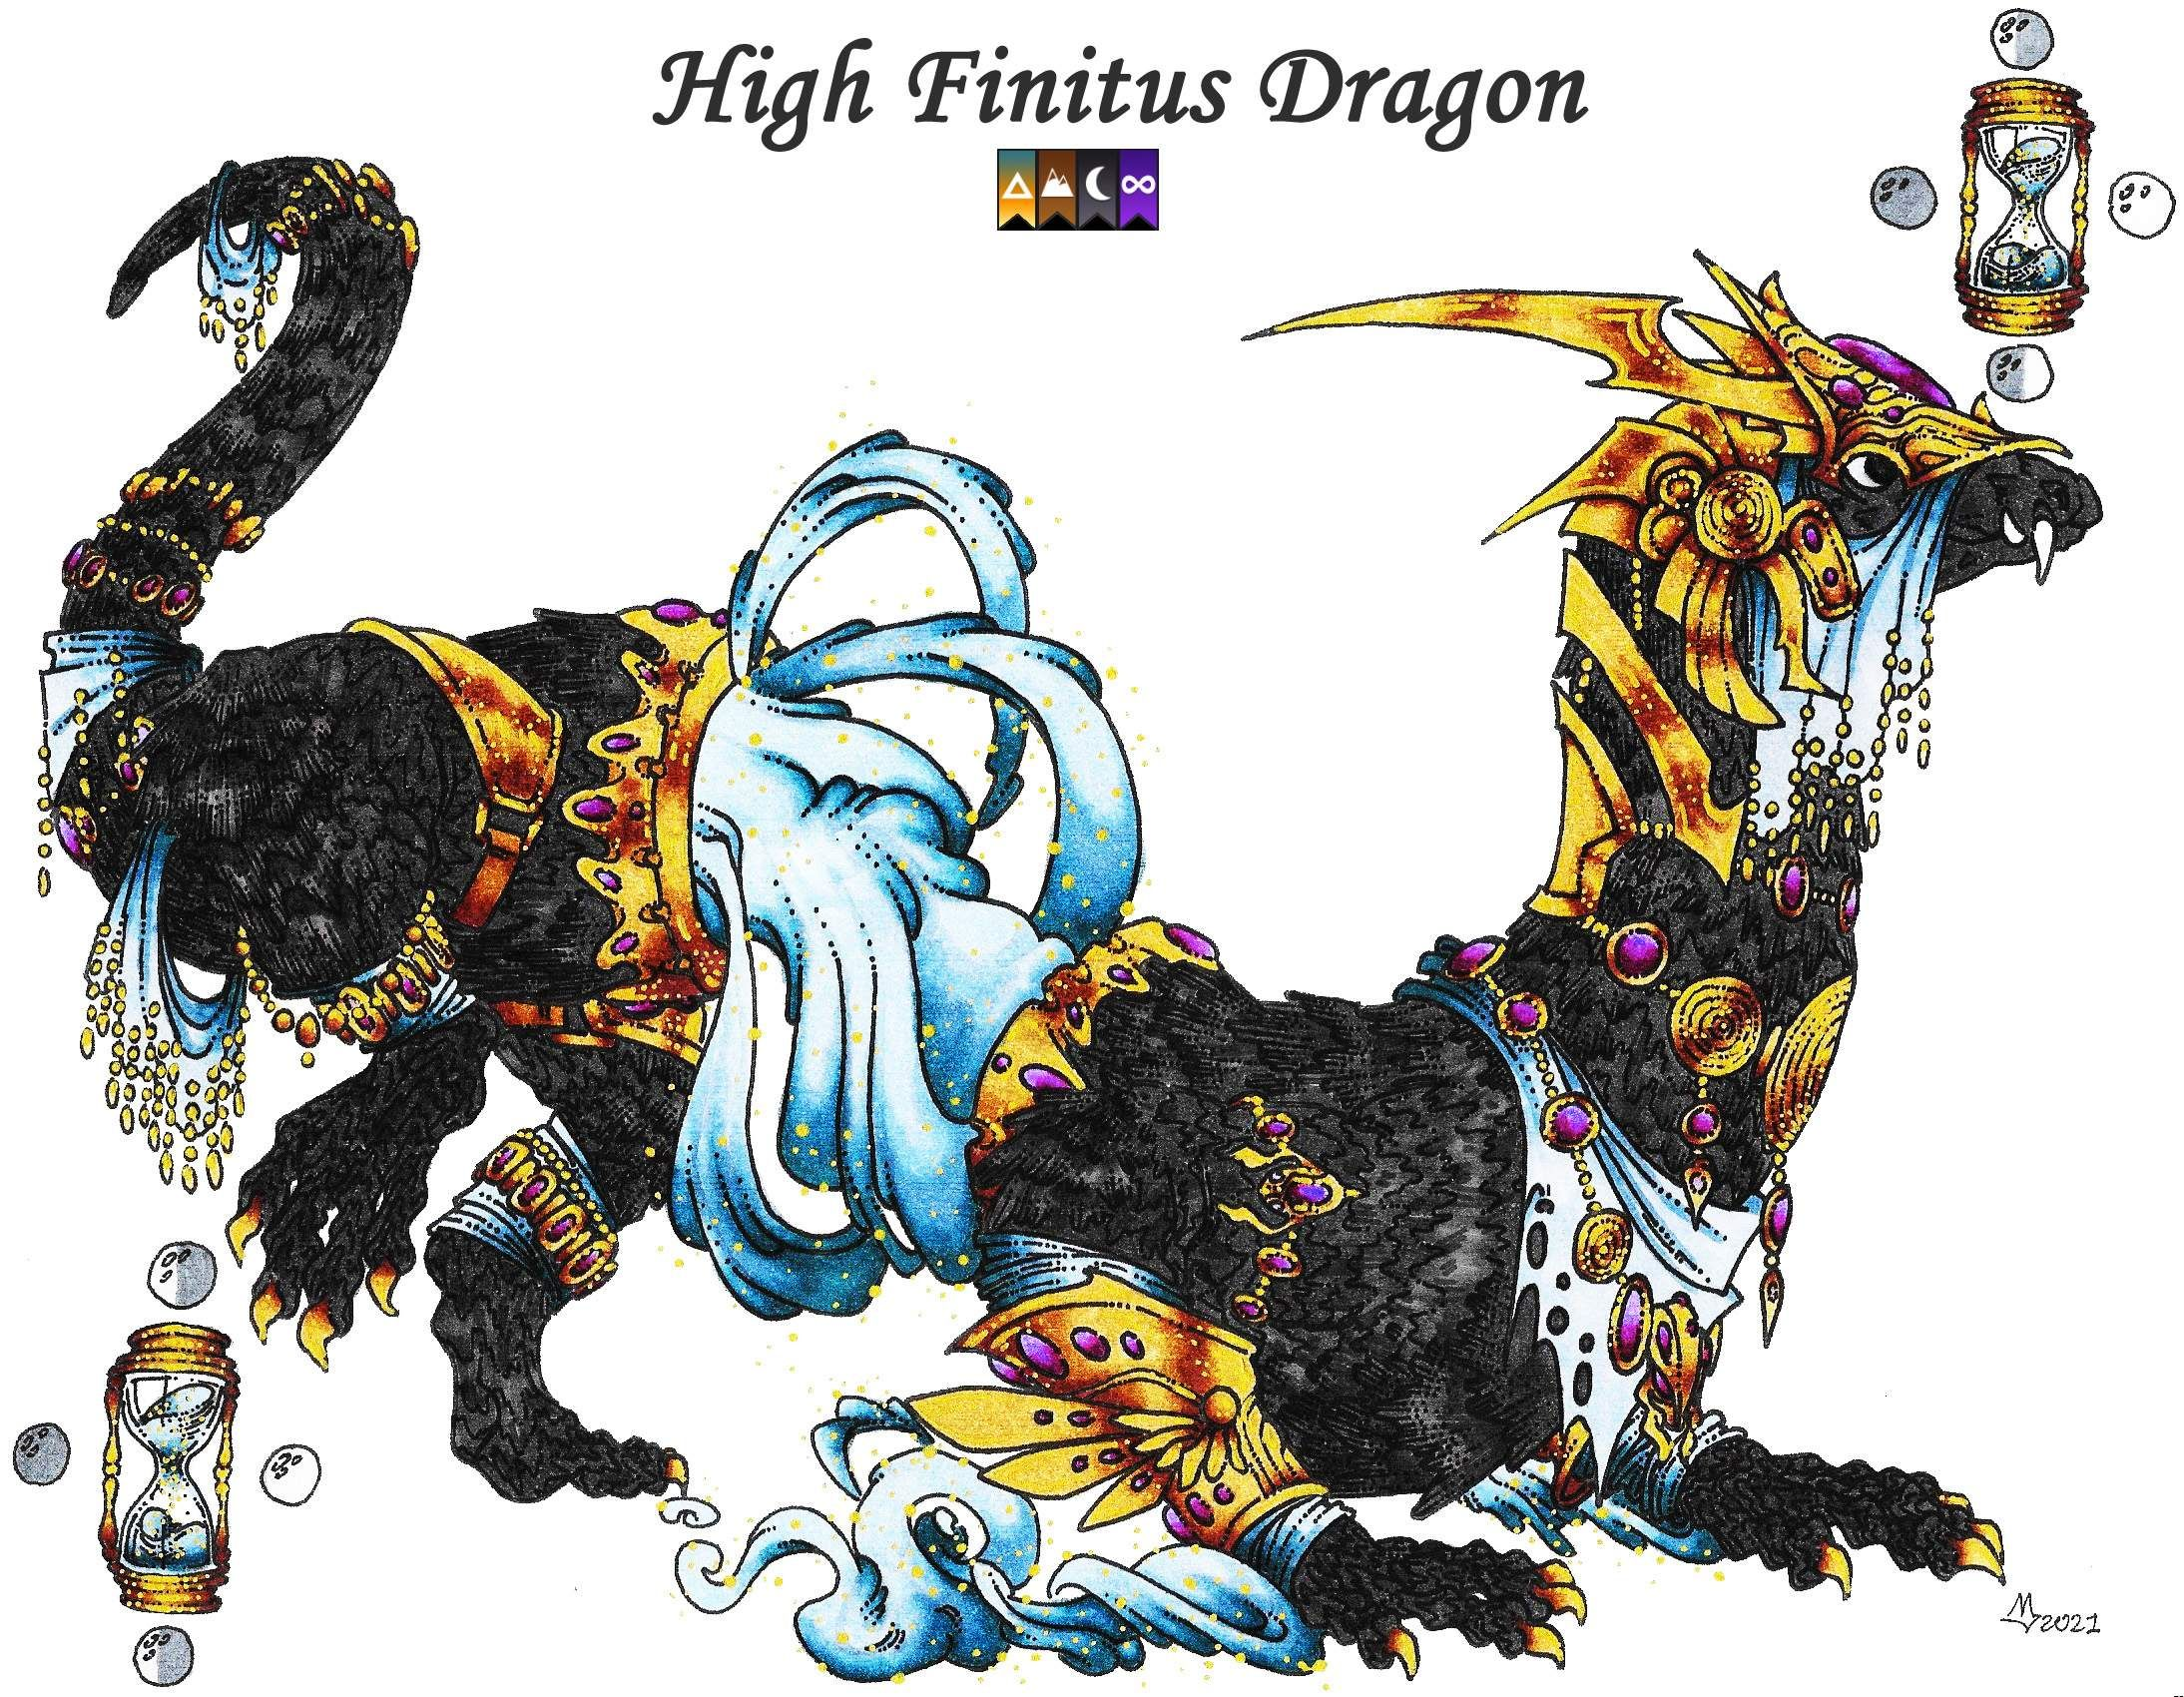 0_1617220644896_High Finitus Dragon, Anthony Valencia.jpg